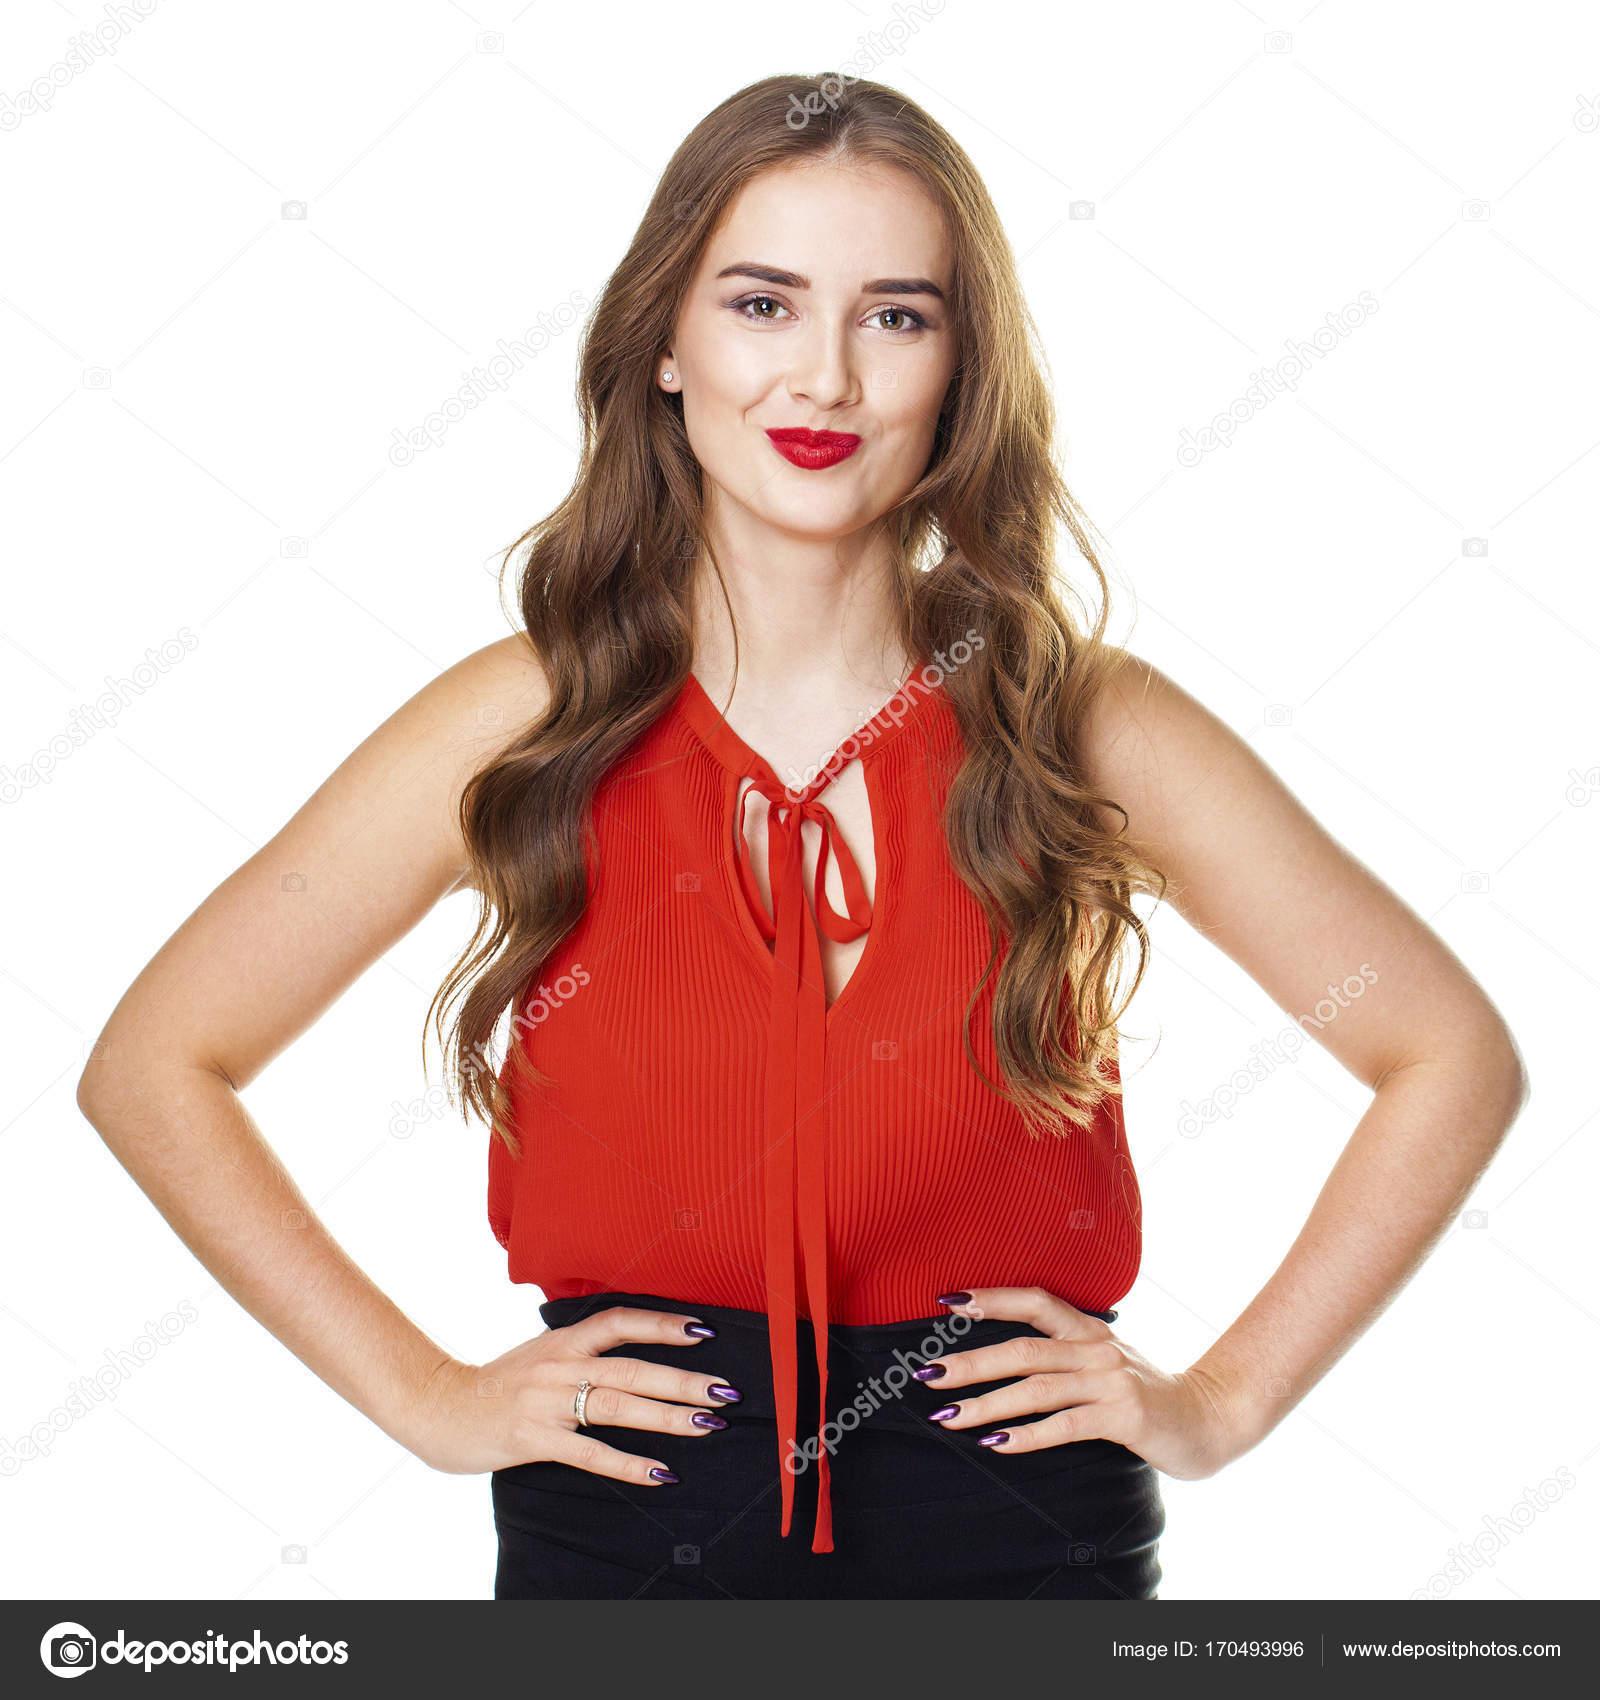 52496e485352 Πορτρέτο του μια νεαρή όμορφη γυναίκα σε μια κόκκινη μπλούζα — Φωτογραφία  Αρχείου